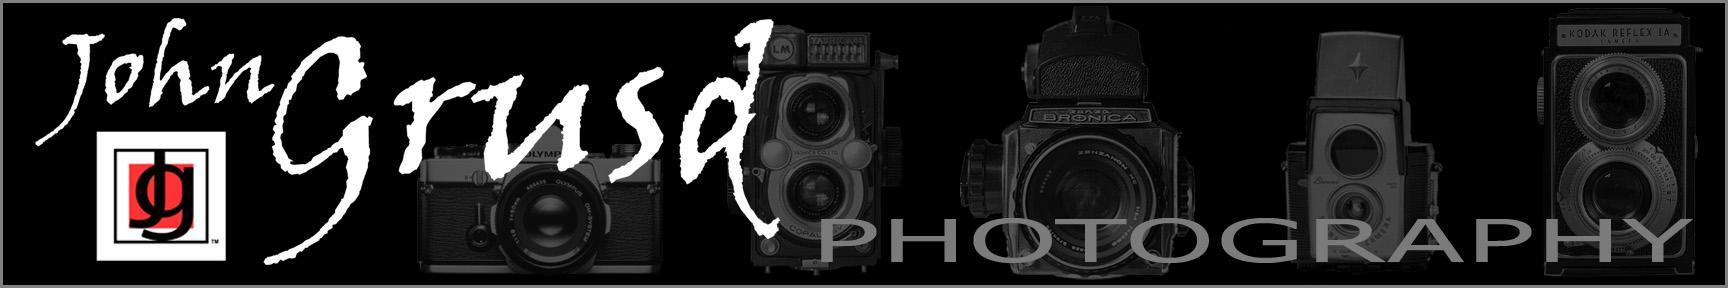 John Grusd Photography